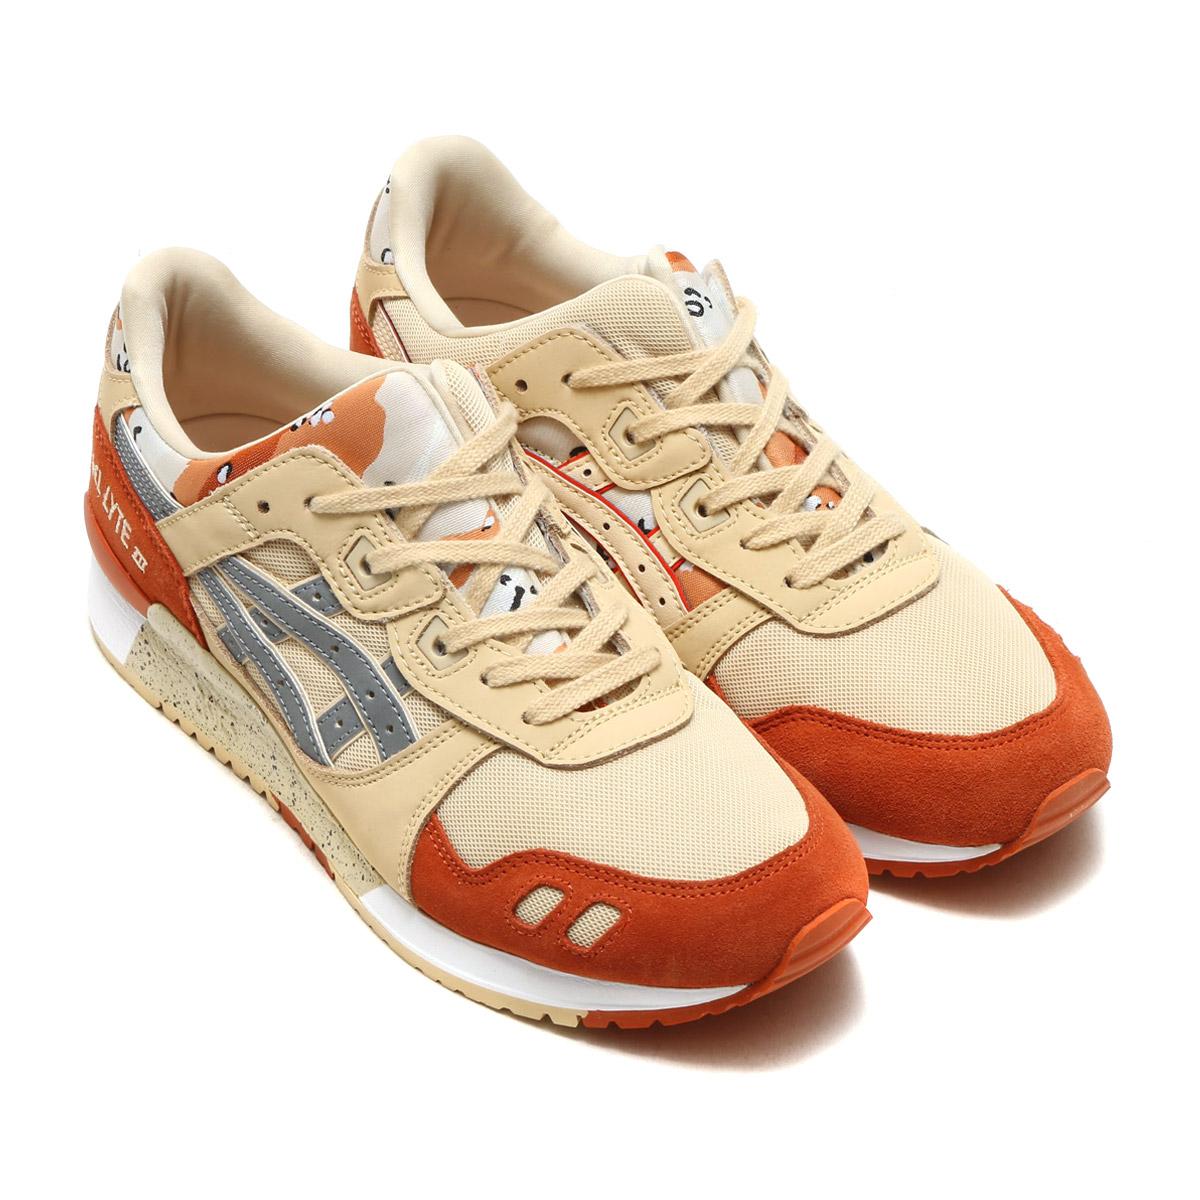 Asics Tiger Gel Lyte chaussures marzipan 3QKkqo